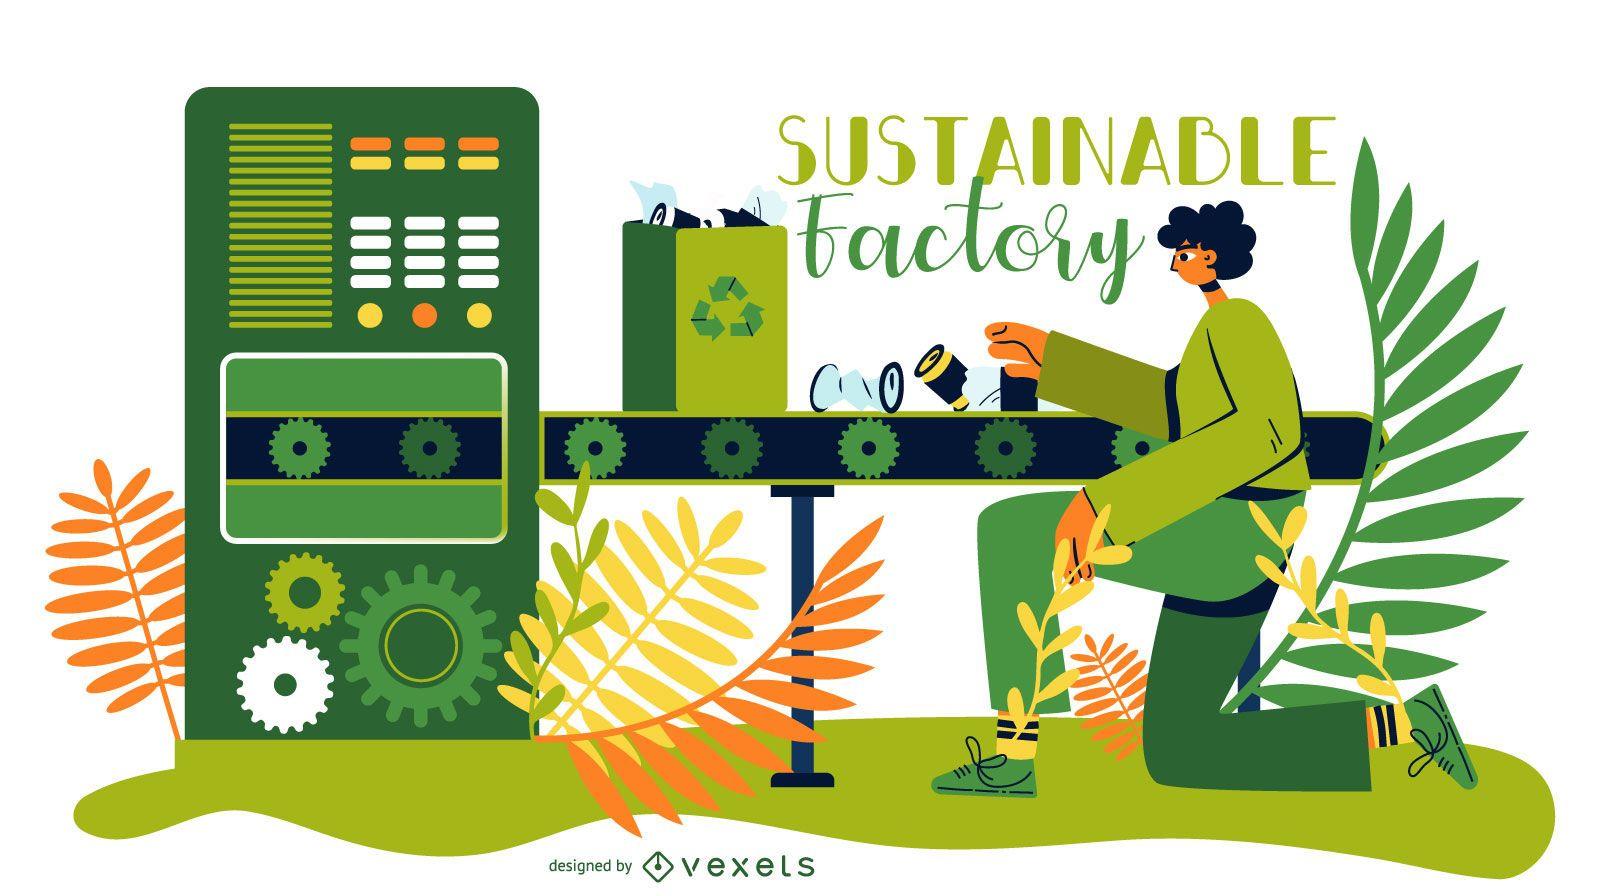 Sustainable Energy Factory Illustration